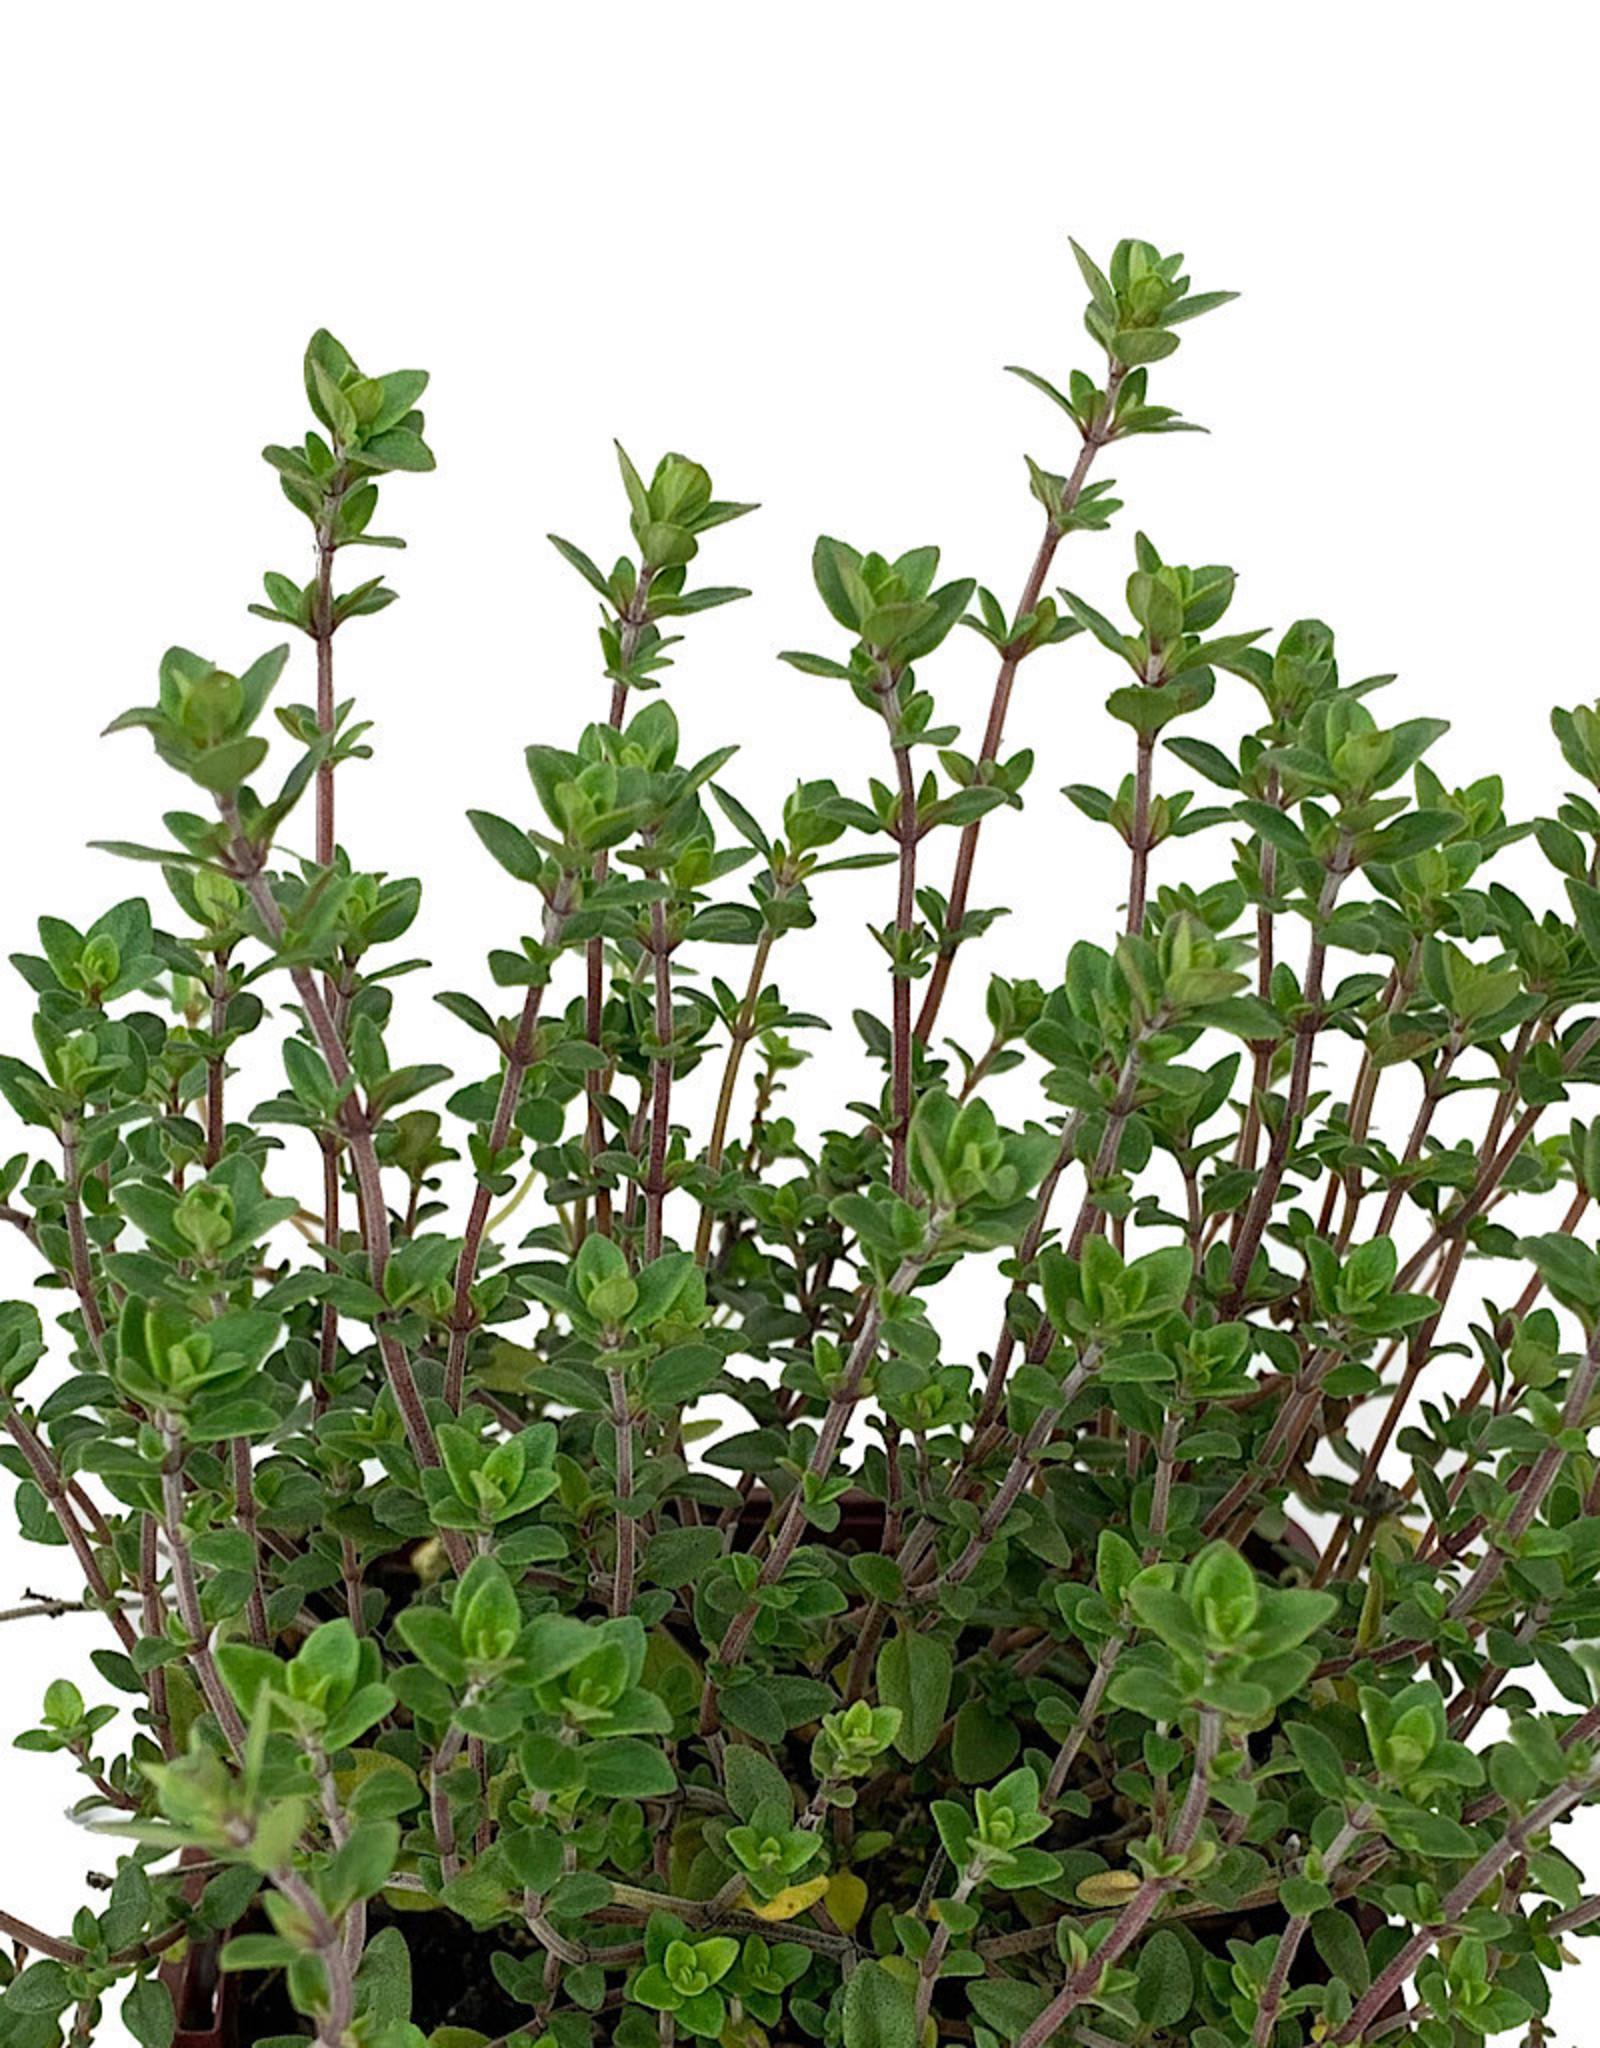 Thymus c. 'English Wedgewood' - 4 Inch